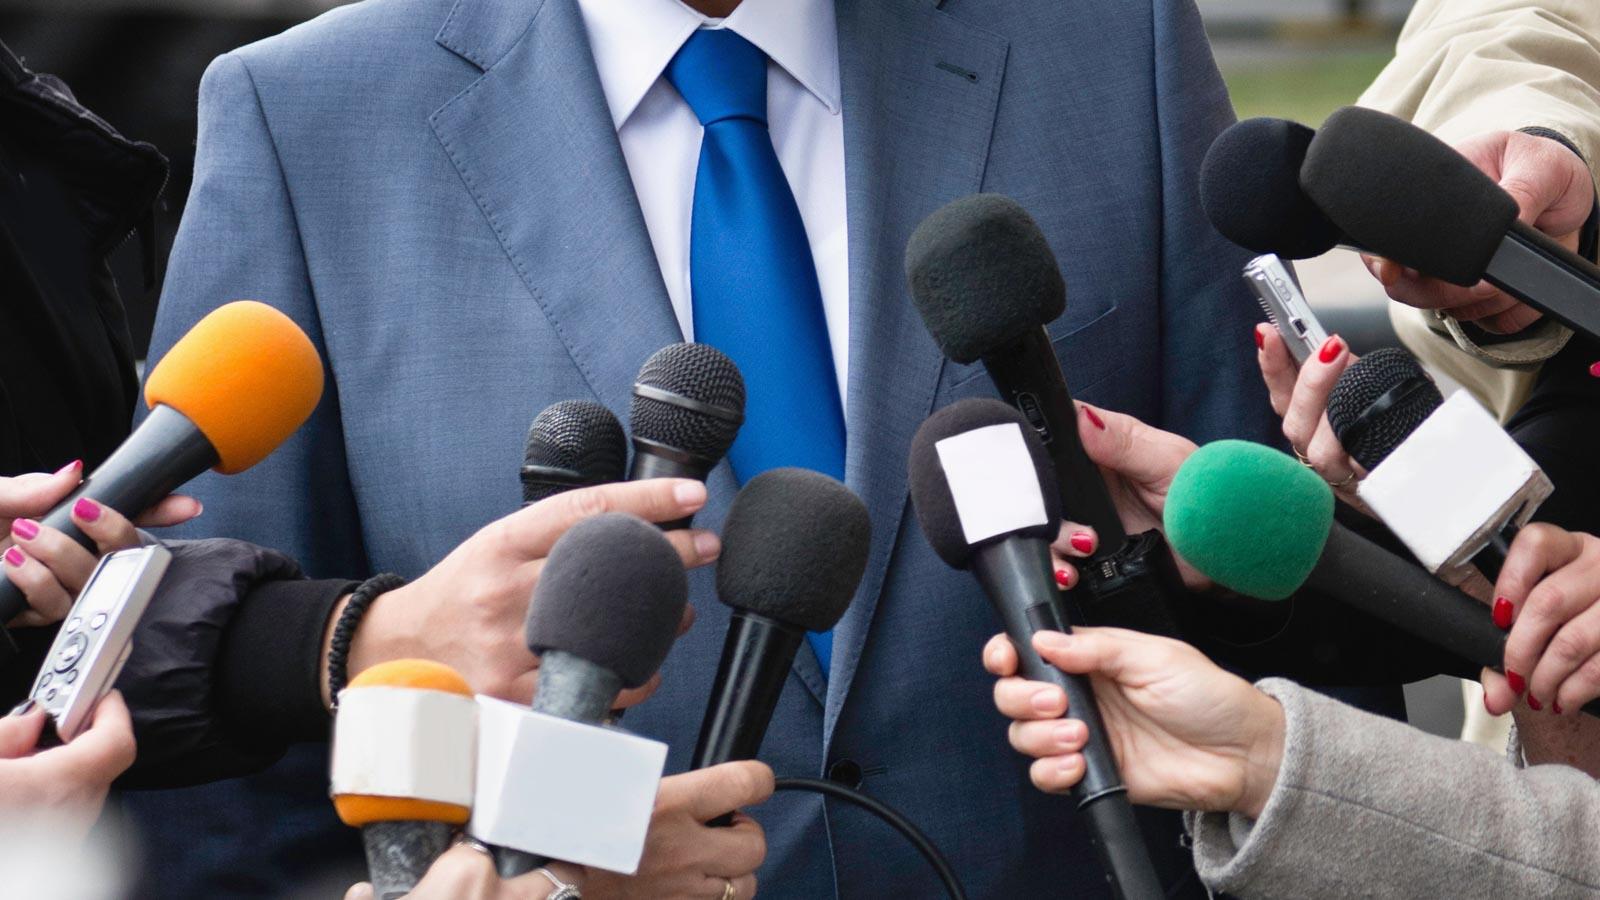 Reporter befragen Politiker. Ausschnittbild mit Mikrofonen.